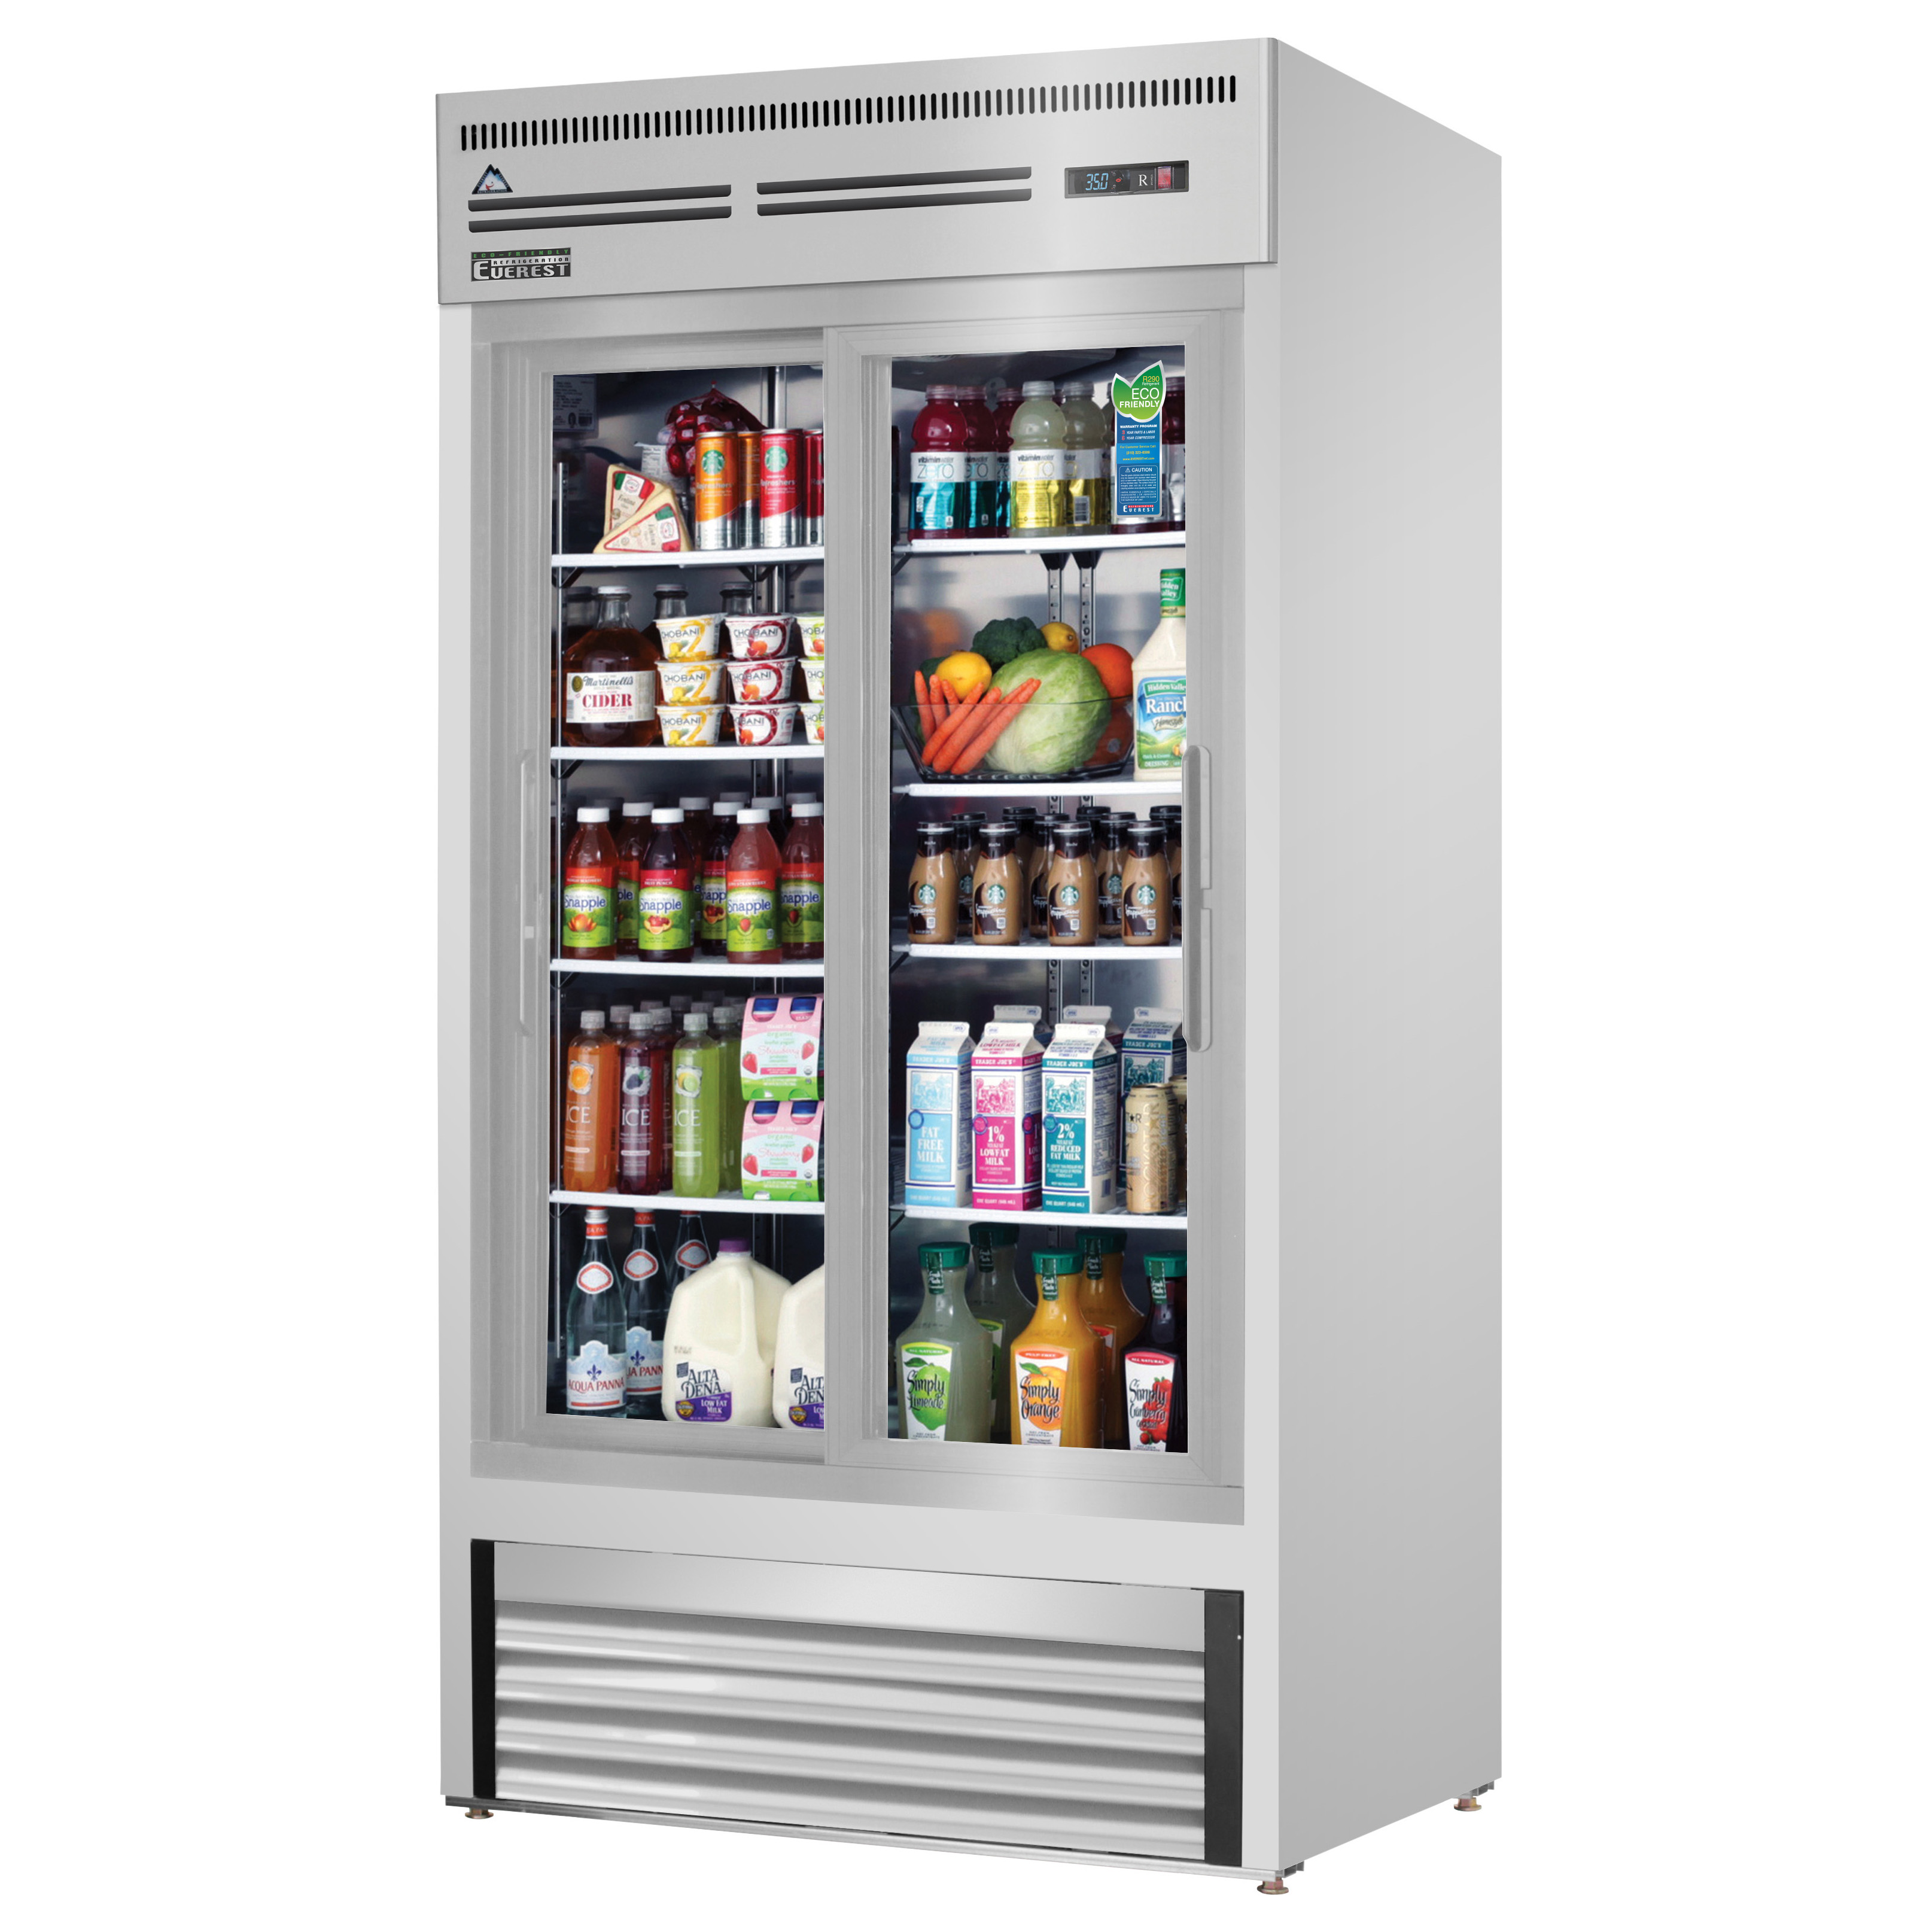 Everest Refrigeration EMGR33-SS refrigerator, merchandiser